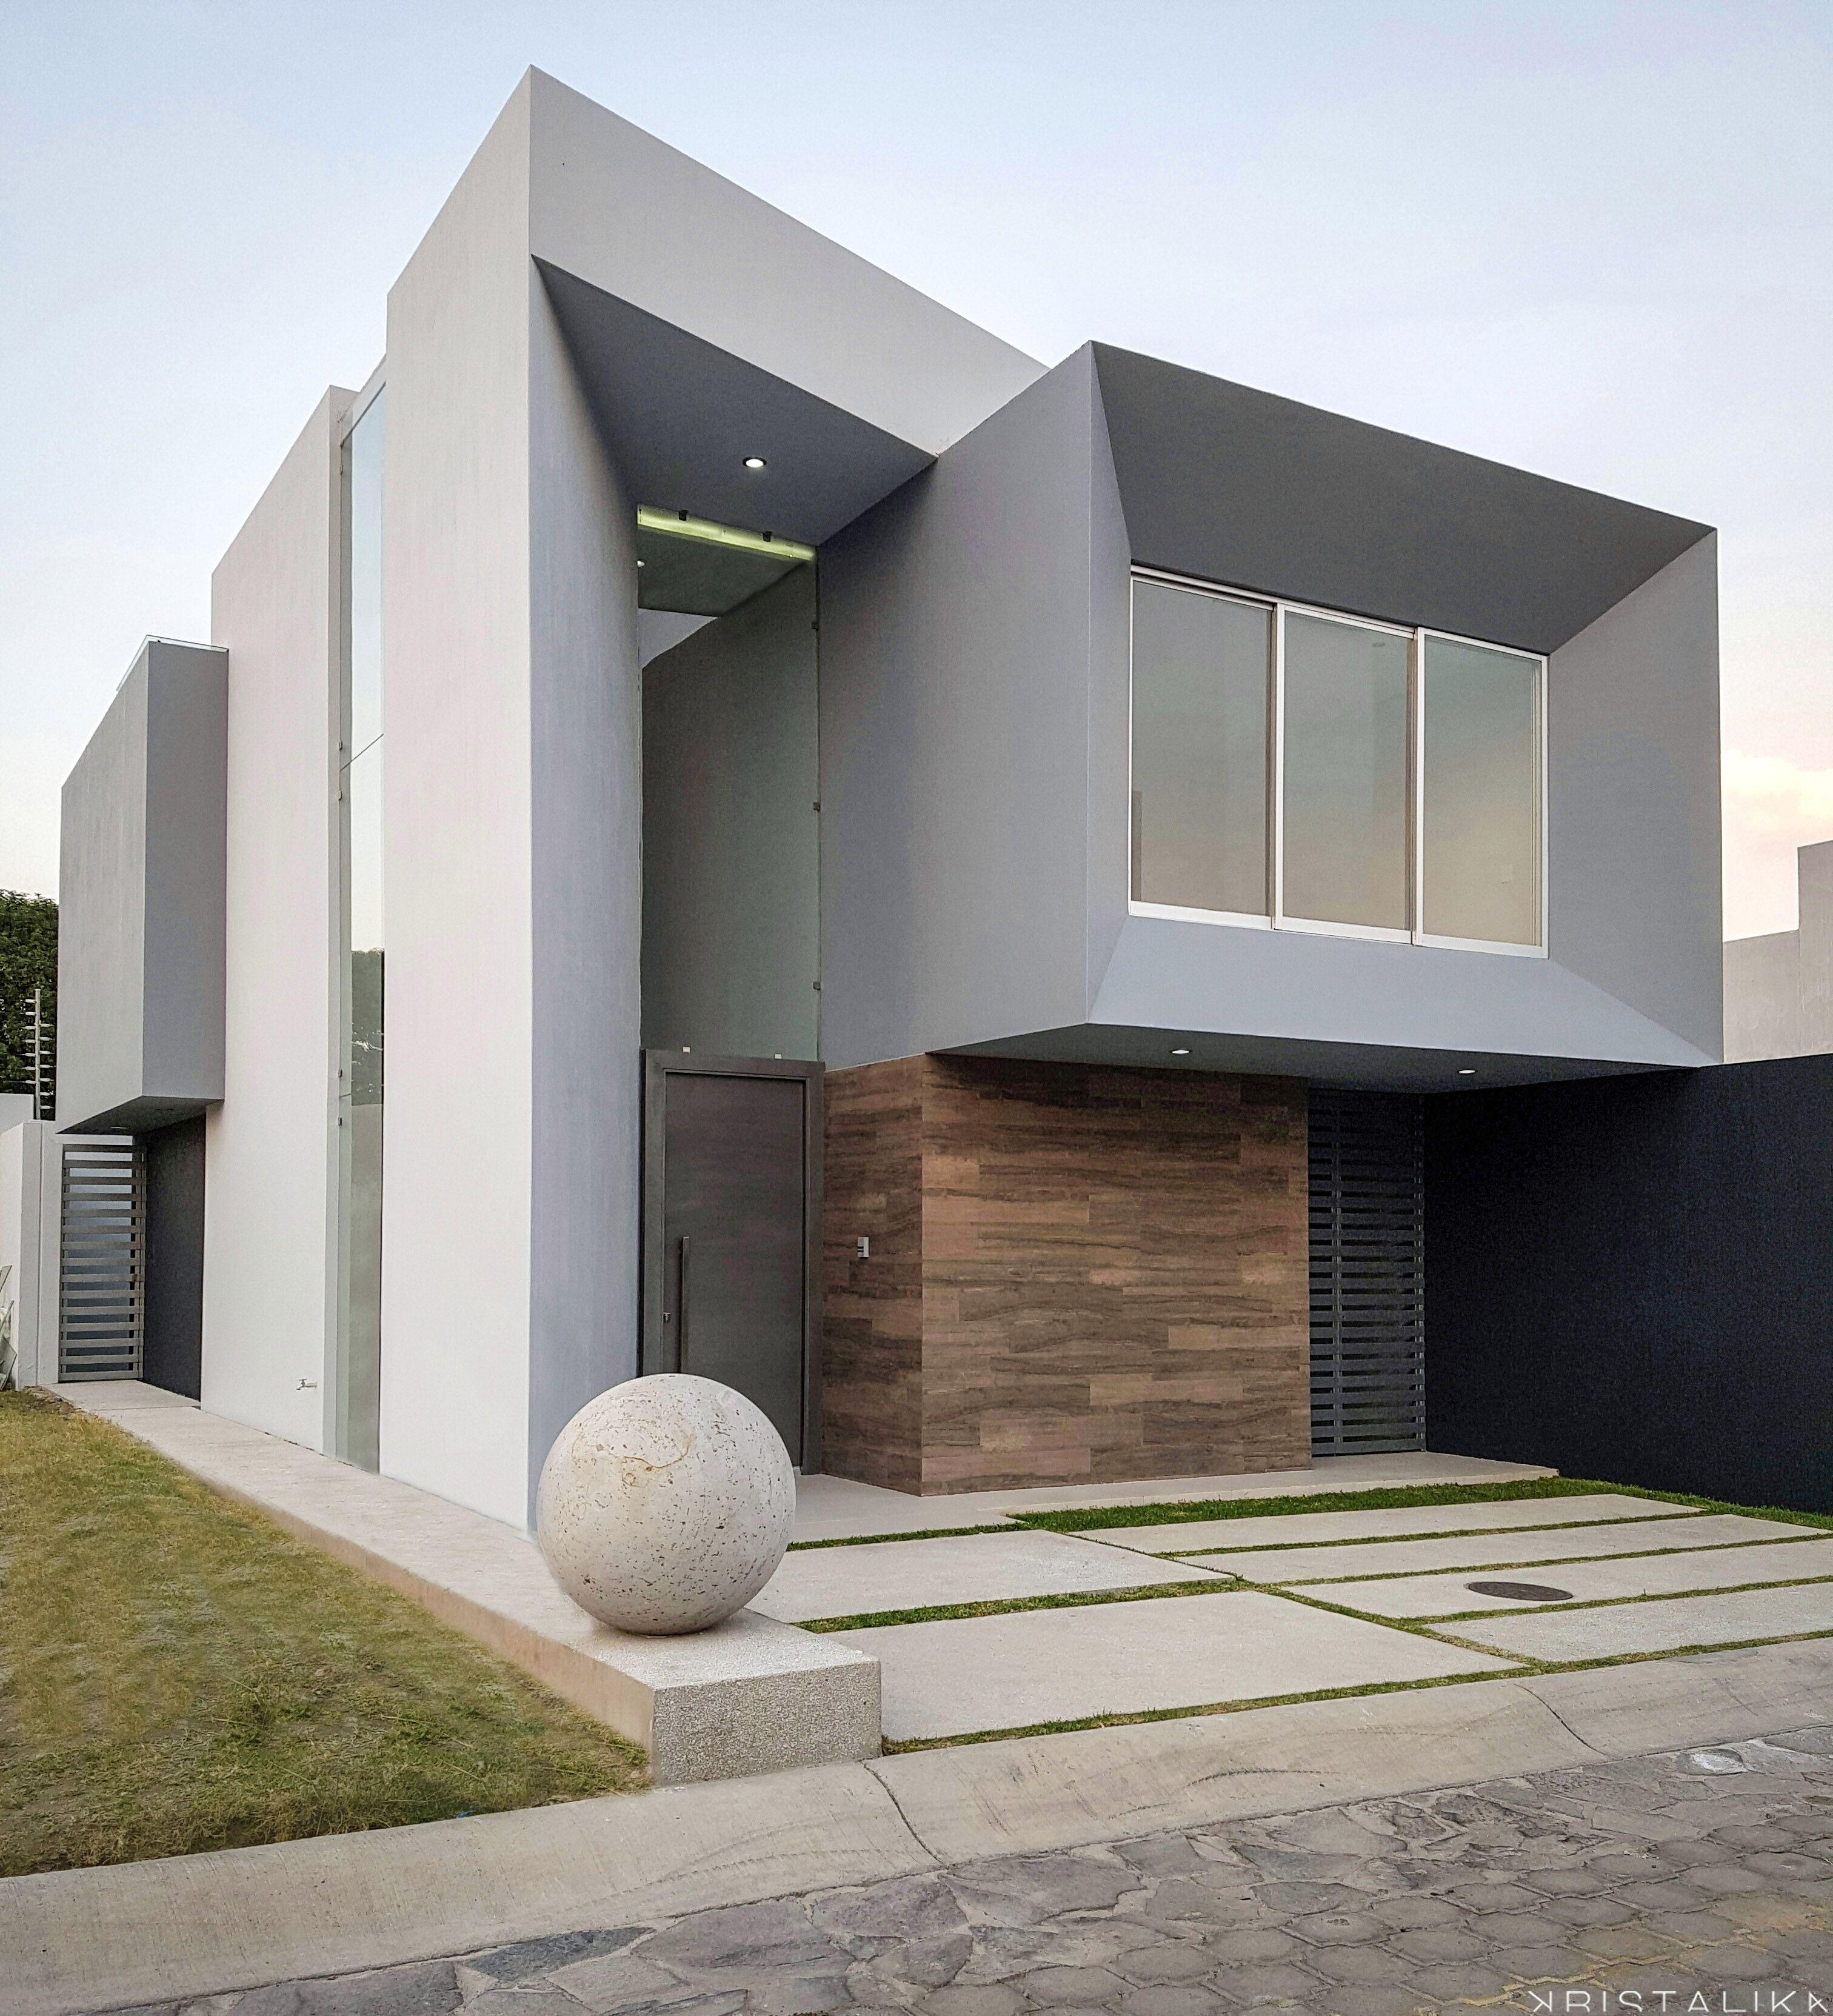 RSI HOUSE Fachadas Modernas Pinterest House Architecture - A beautiful villa in ljubljana every minimalist will love